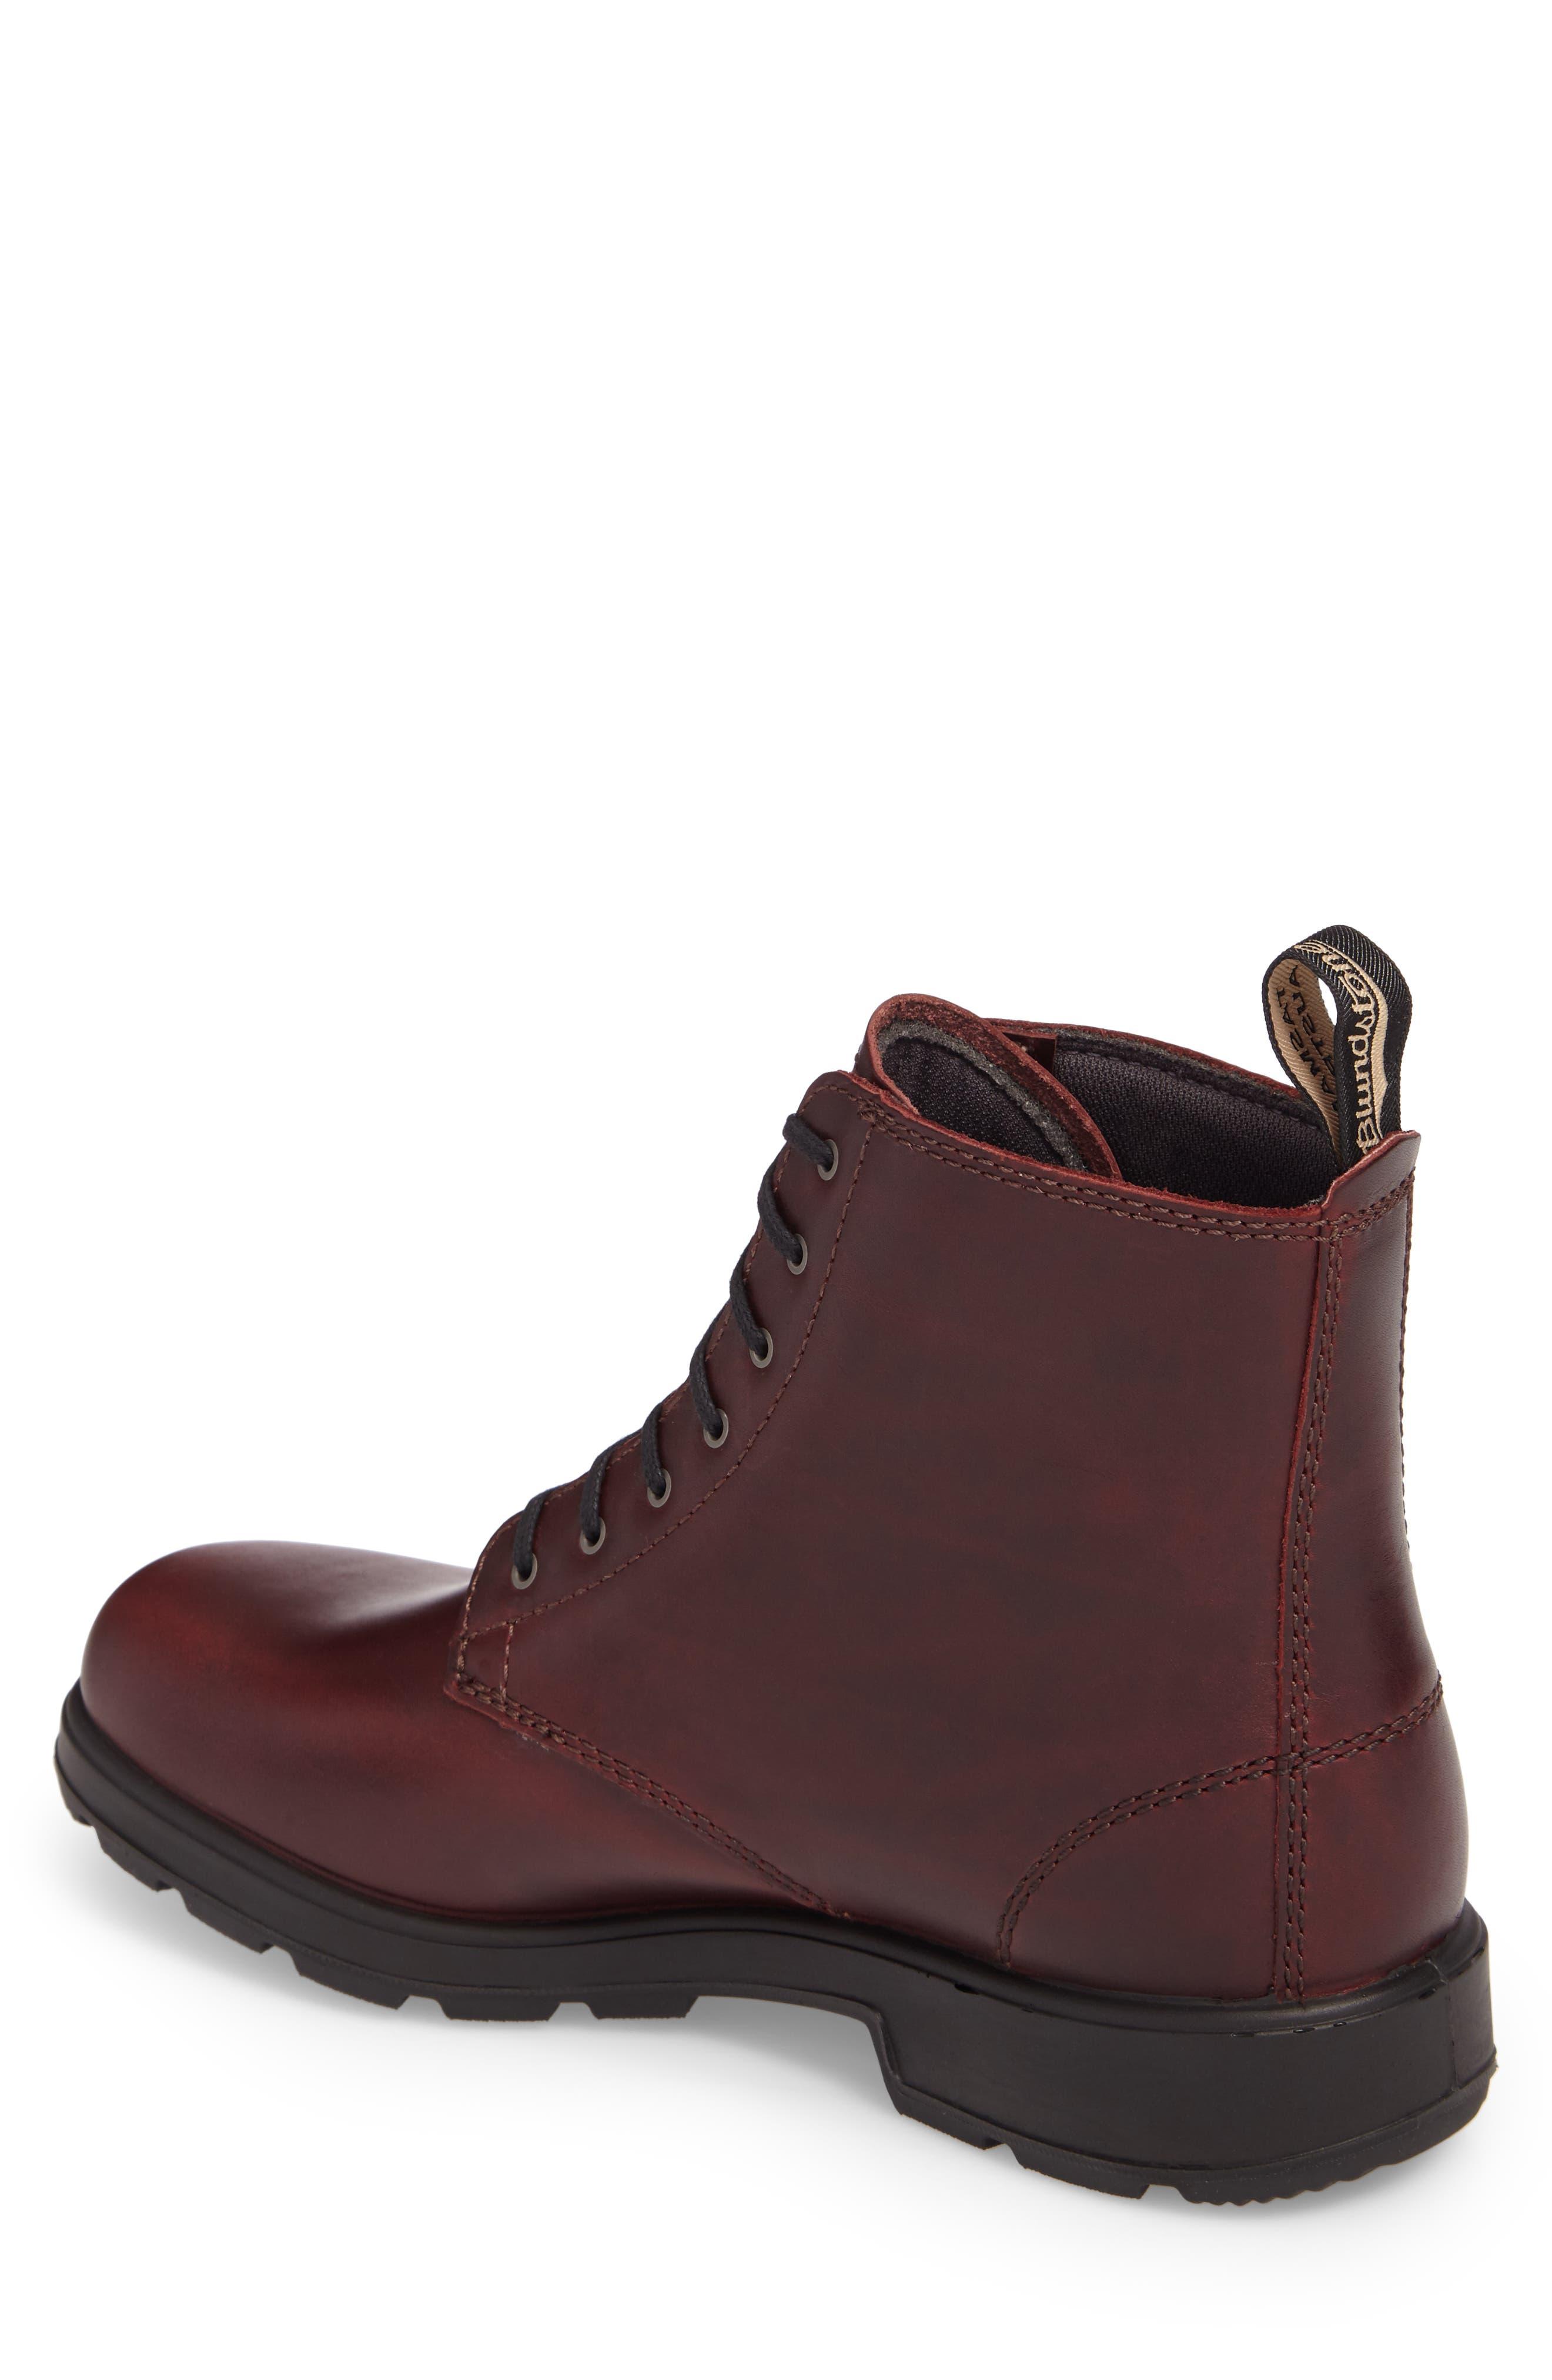 Alternate Image 2  - Blundstone Original Plain Toe Boot (Men)